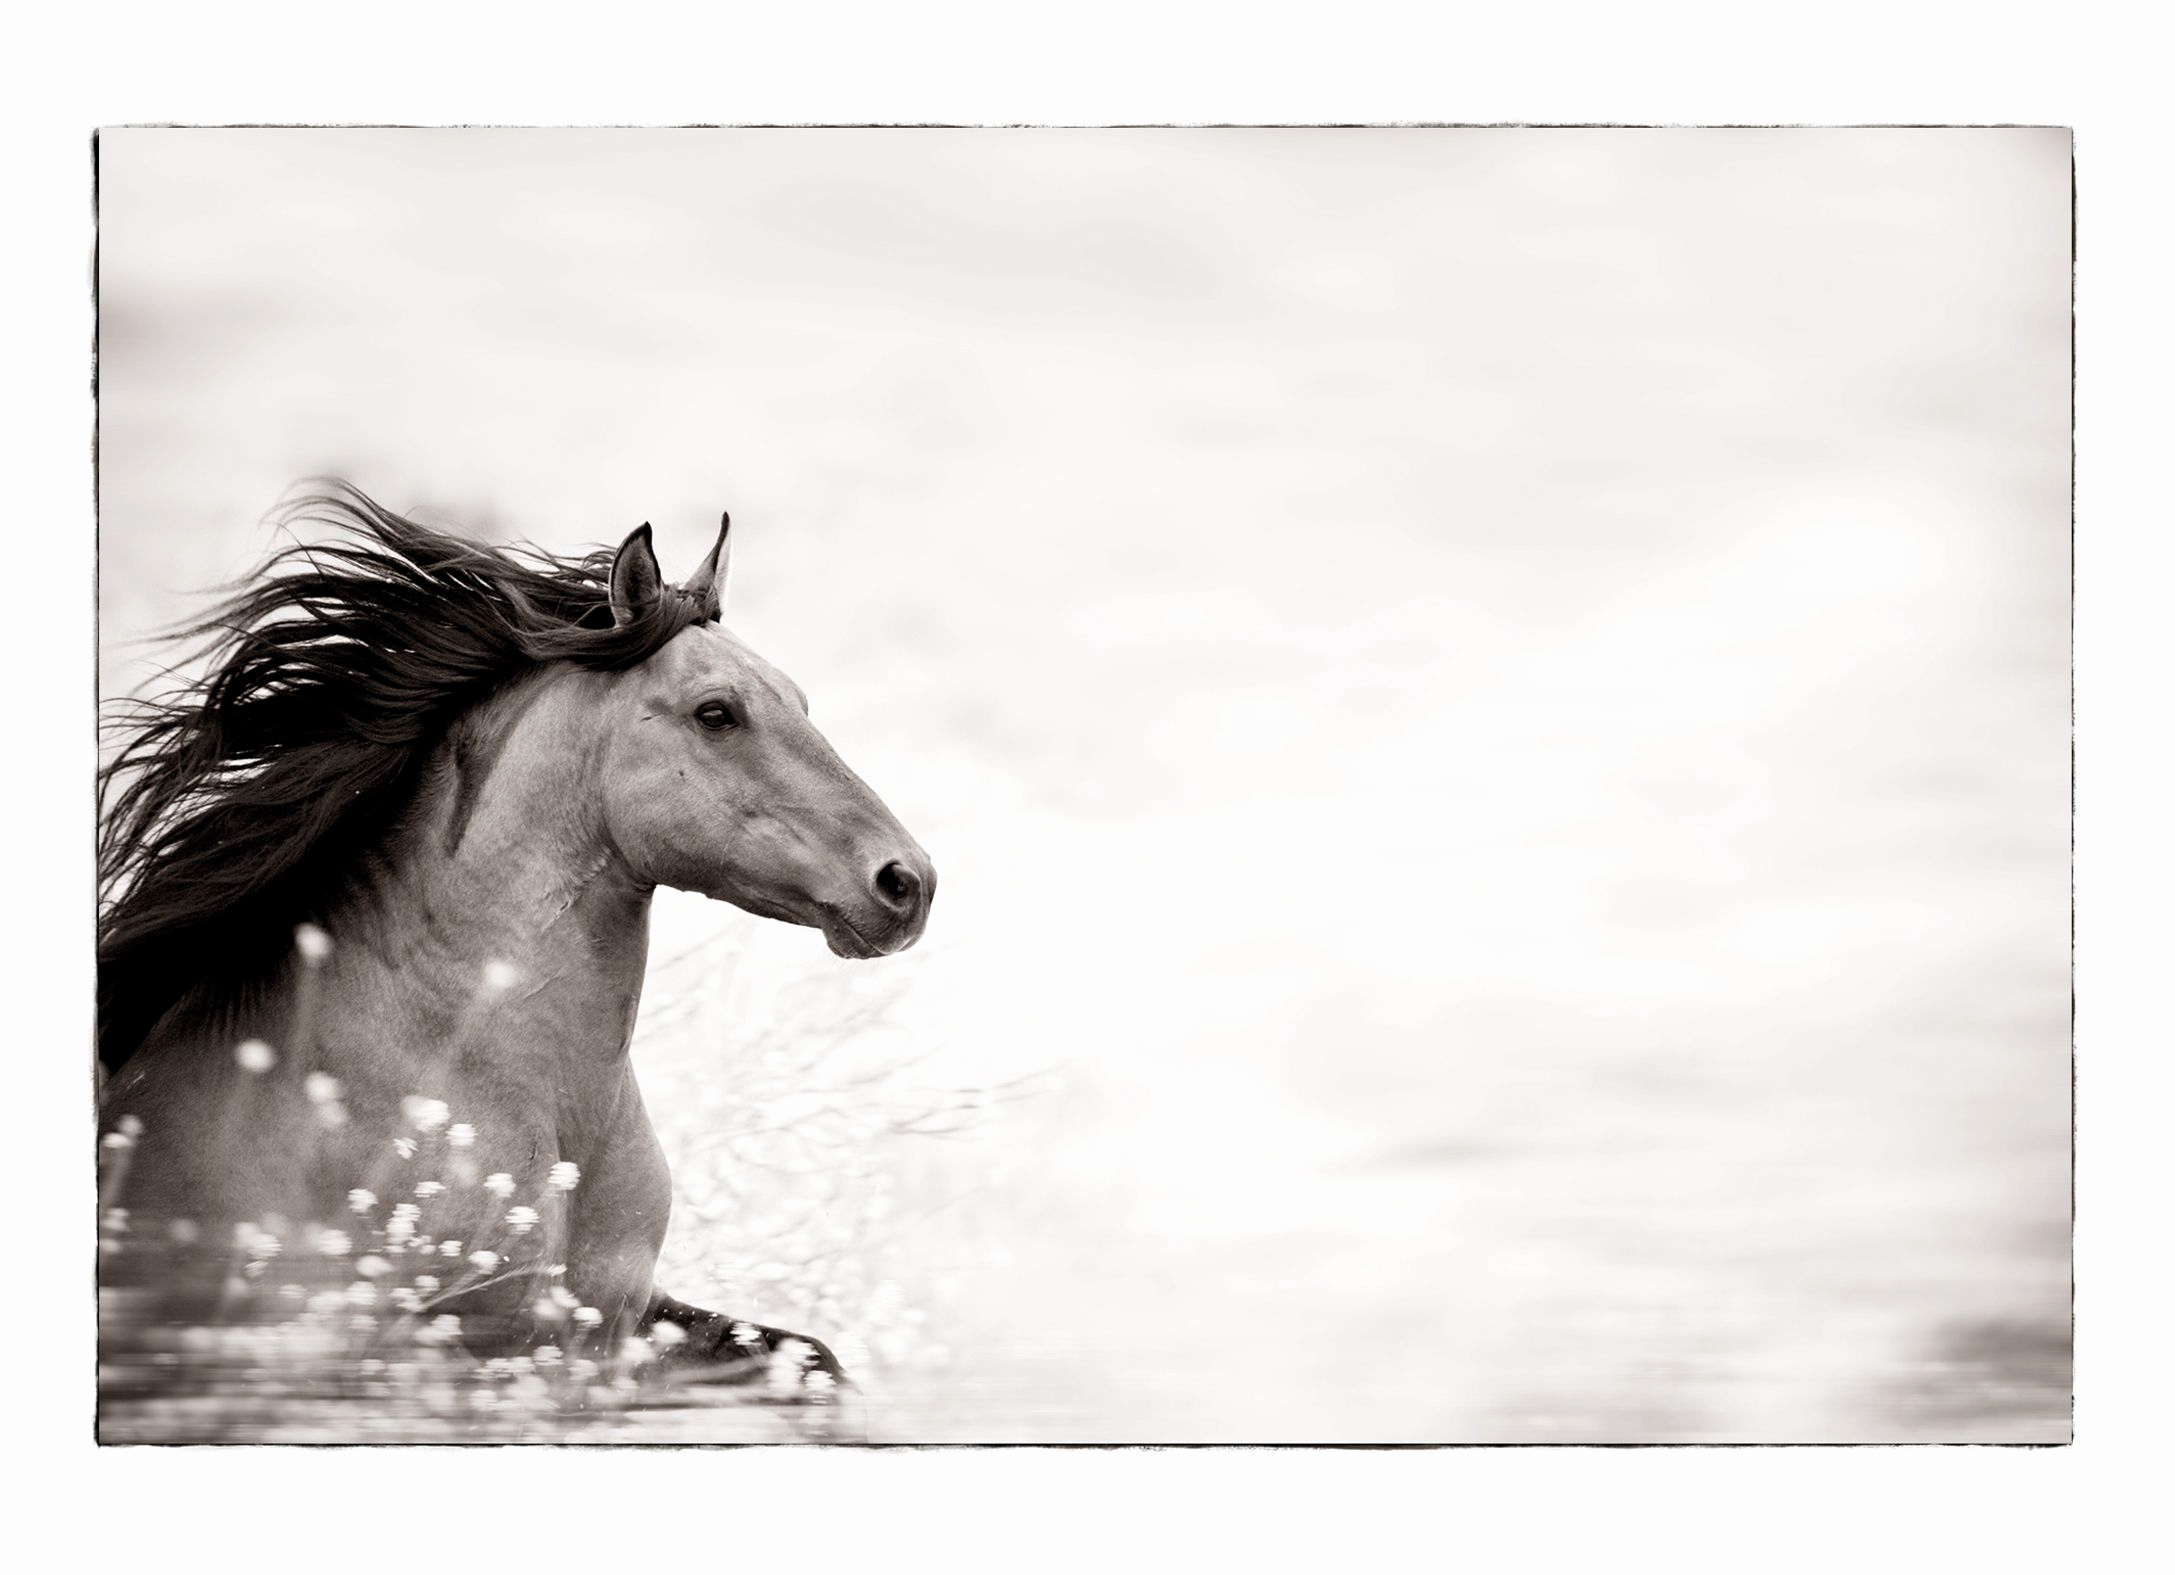 Horseback Riding Gift Certificate Template Lovely Horse Gift Certificate Template Free